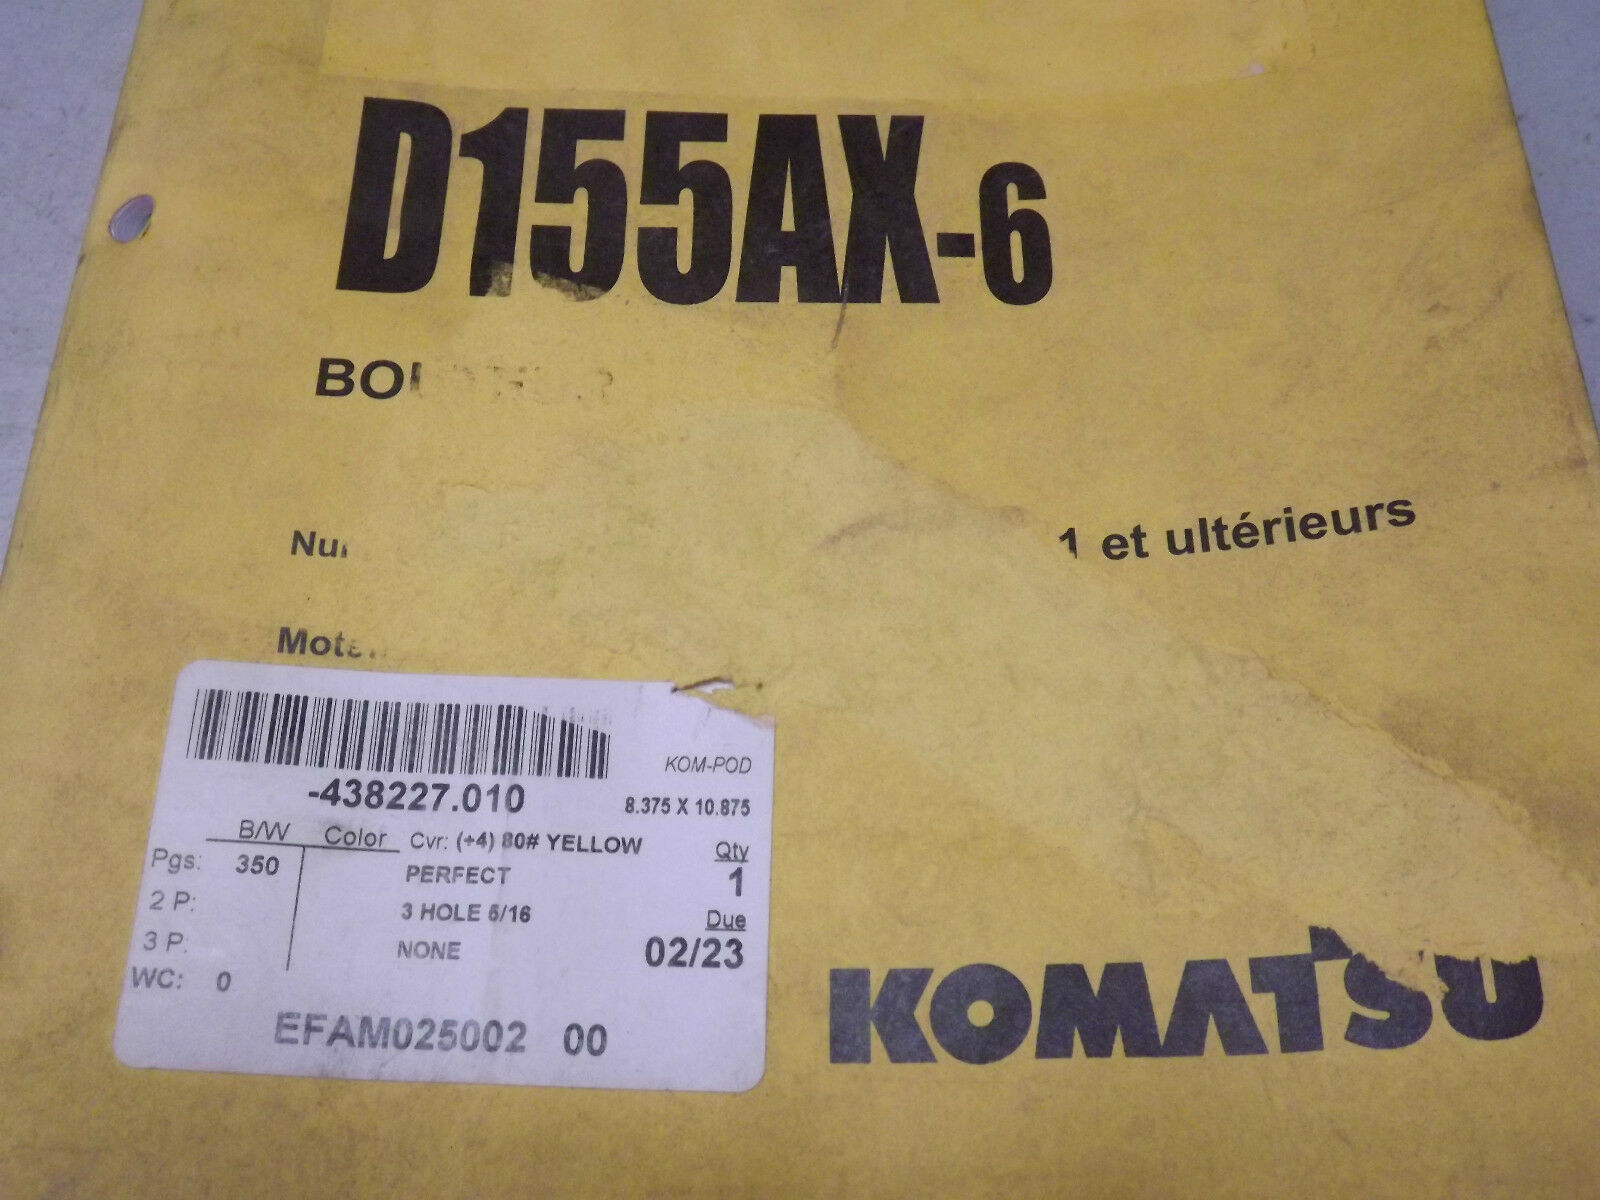 Komatsu D155ax-6 Crawler Dozer Operation Maintenance Manual French Bouteur  | eBay